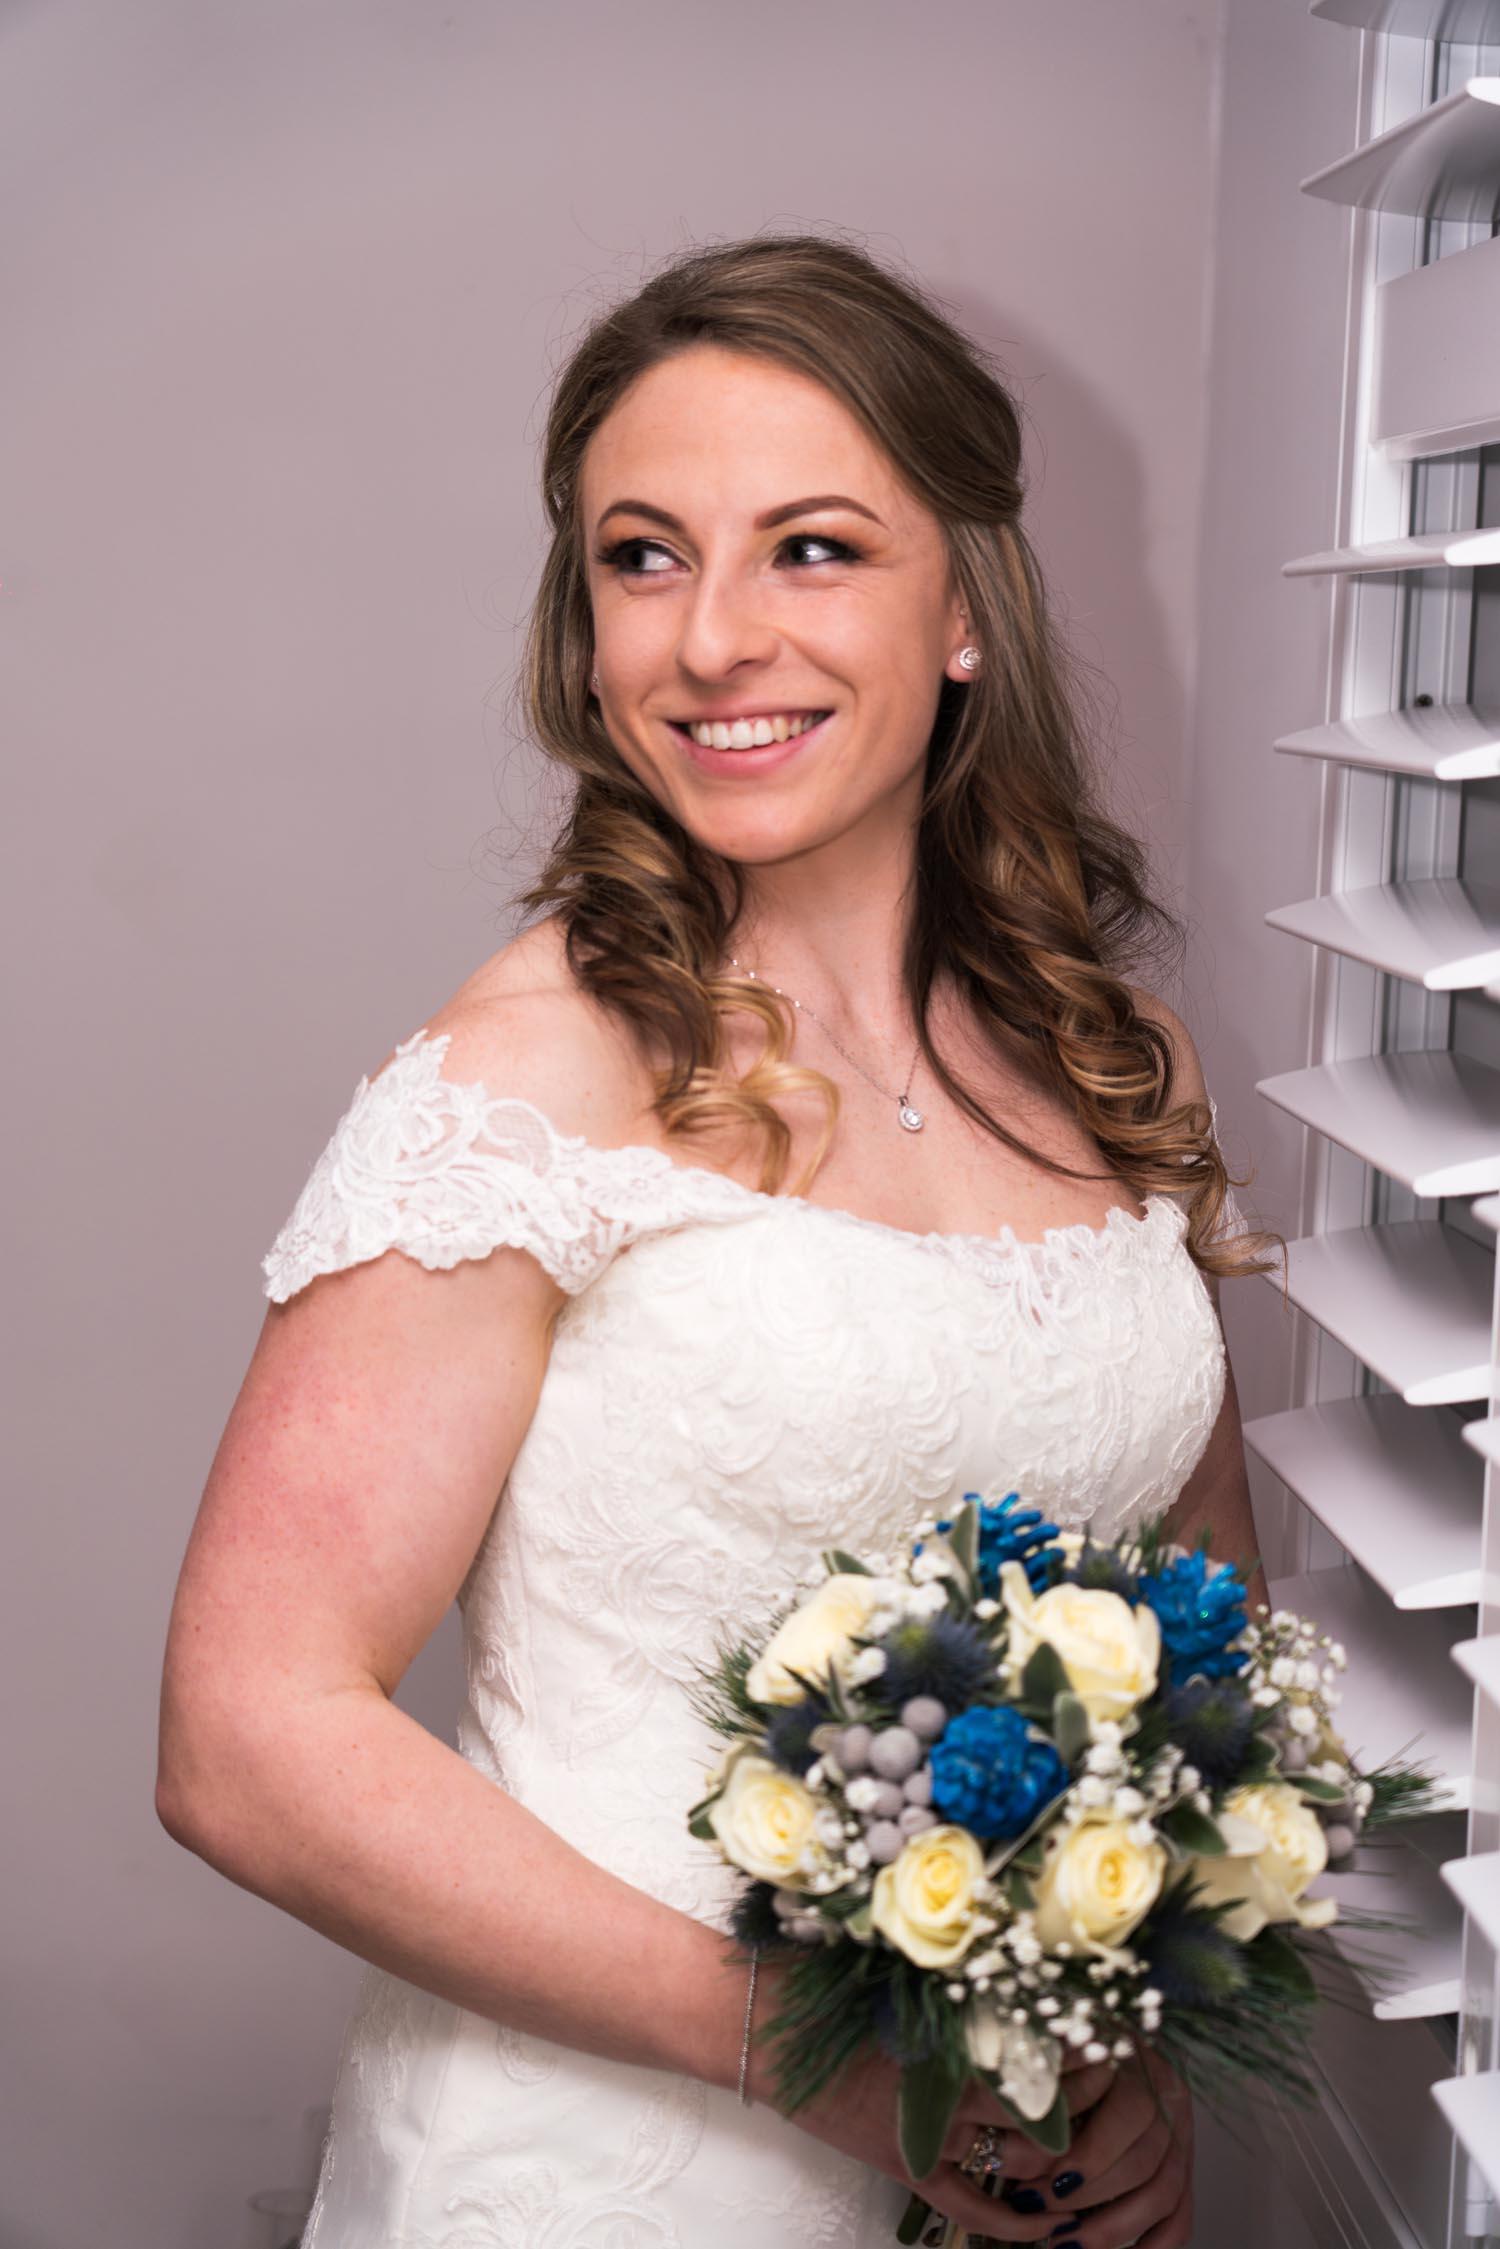 wedding-photos-bridal-preparations-ye-olde-plough-house-essex-068-2.jpg